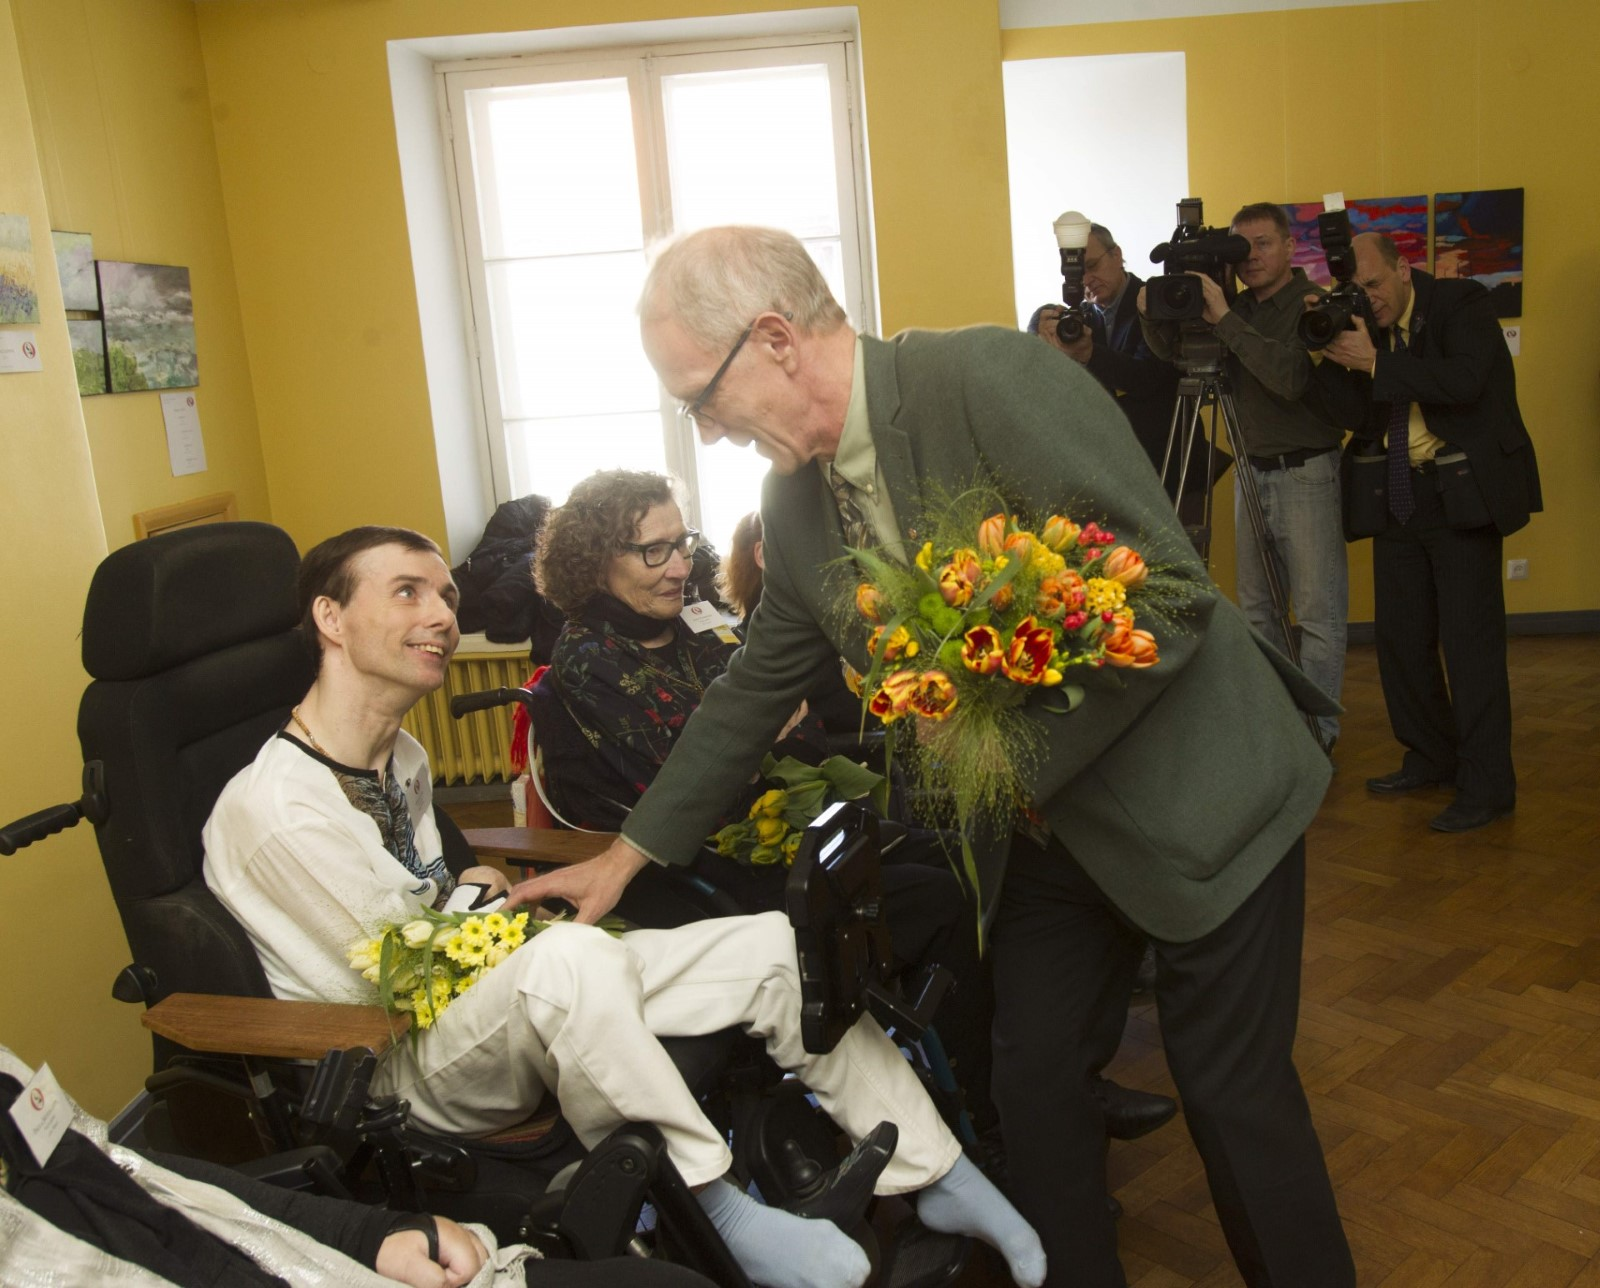 Eiki Nestor ulatab lilli.